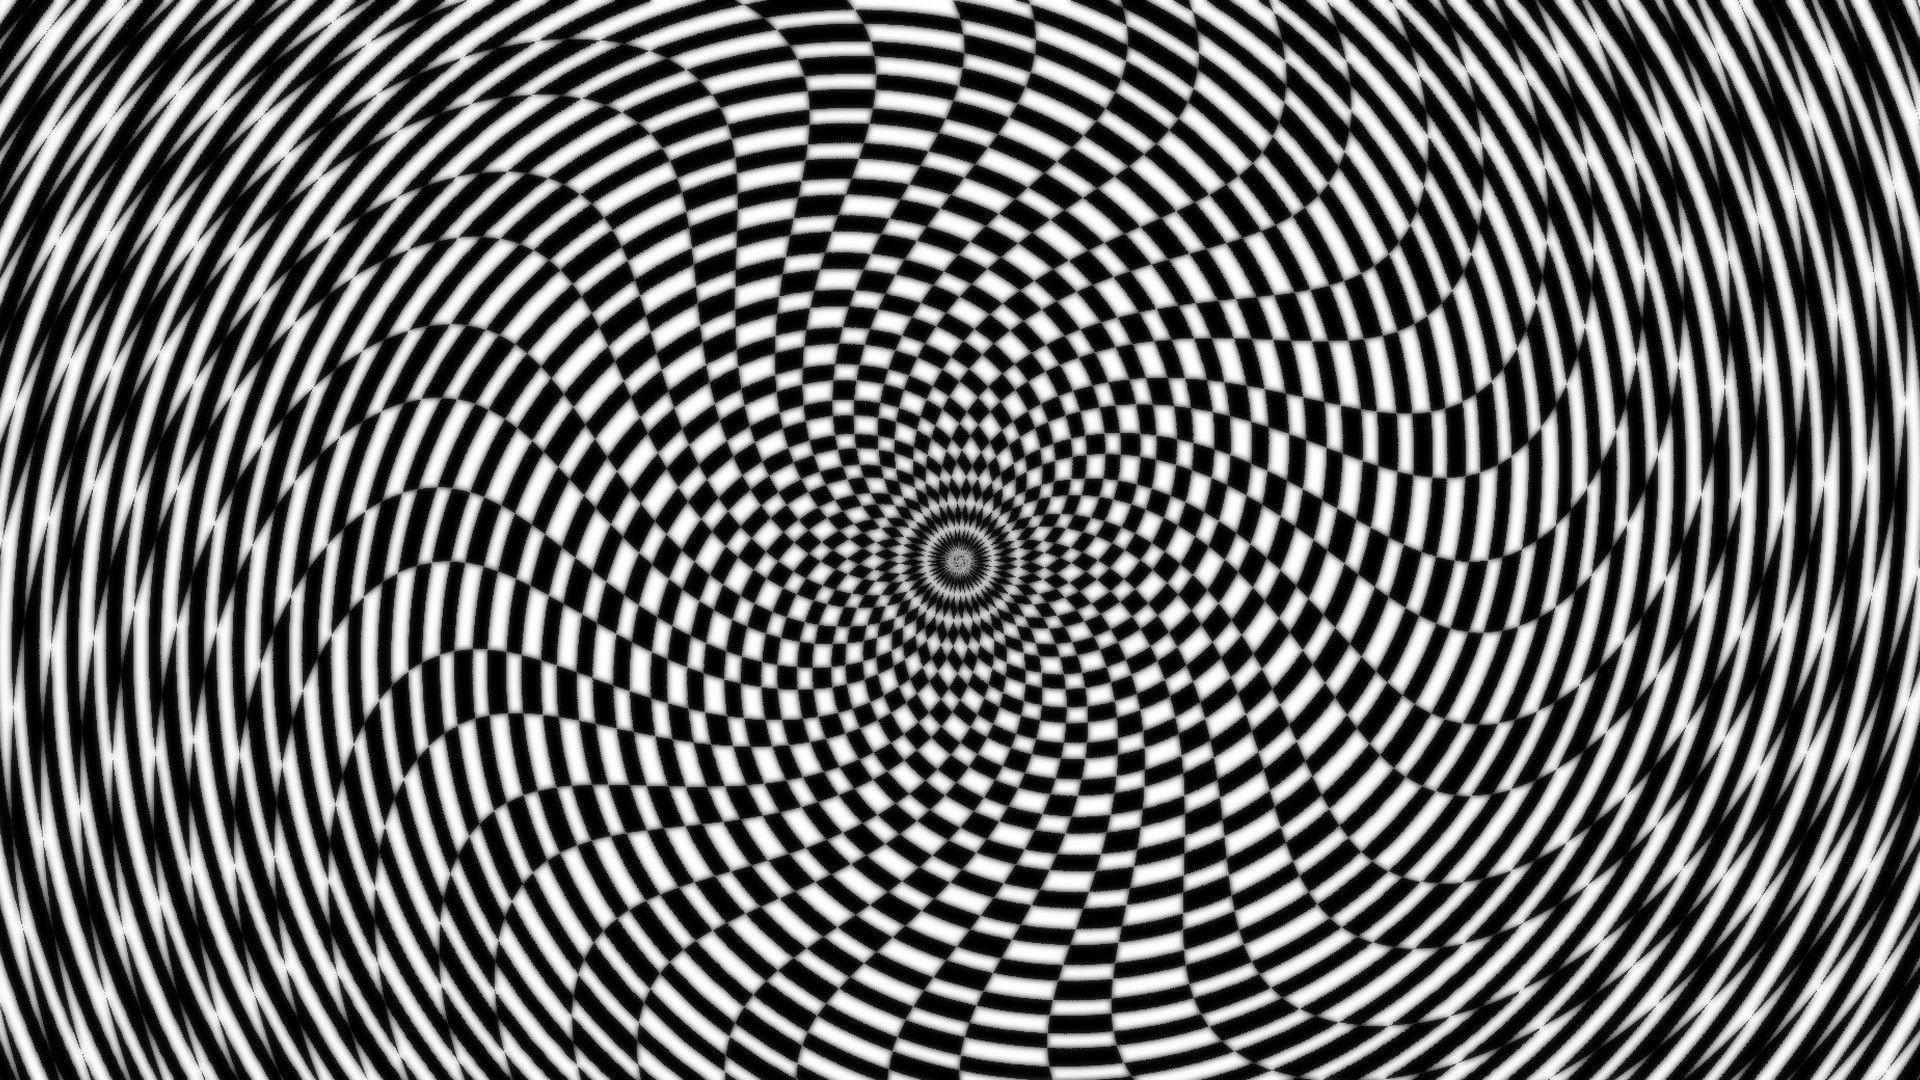 Optical Illusion Desktop Wallpaper